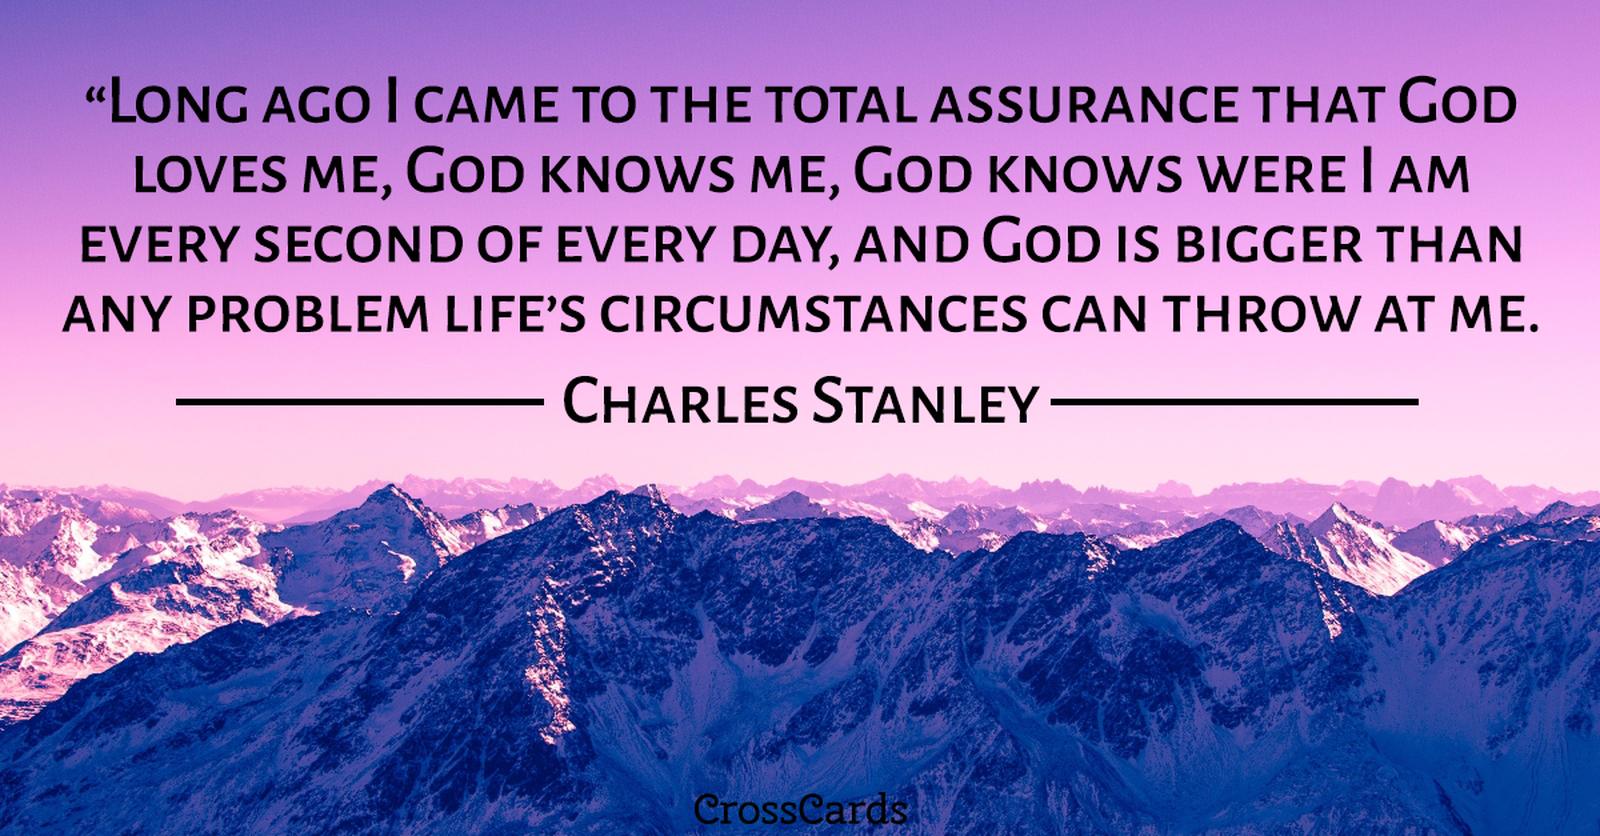 God Knows Me! ecard, online card